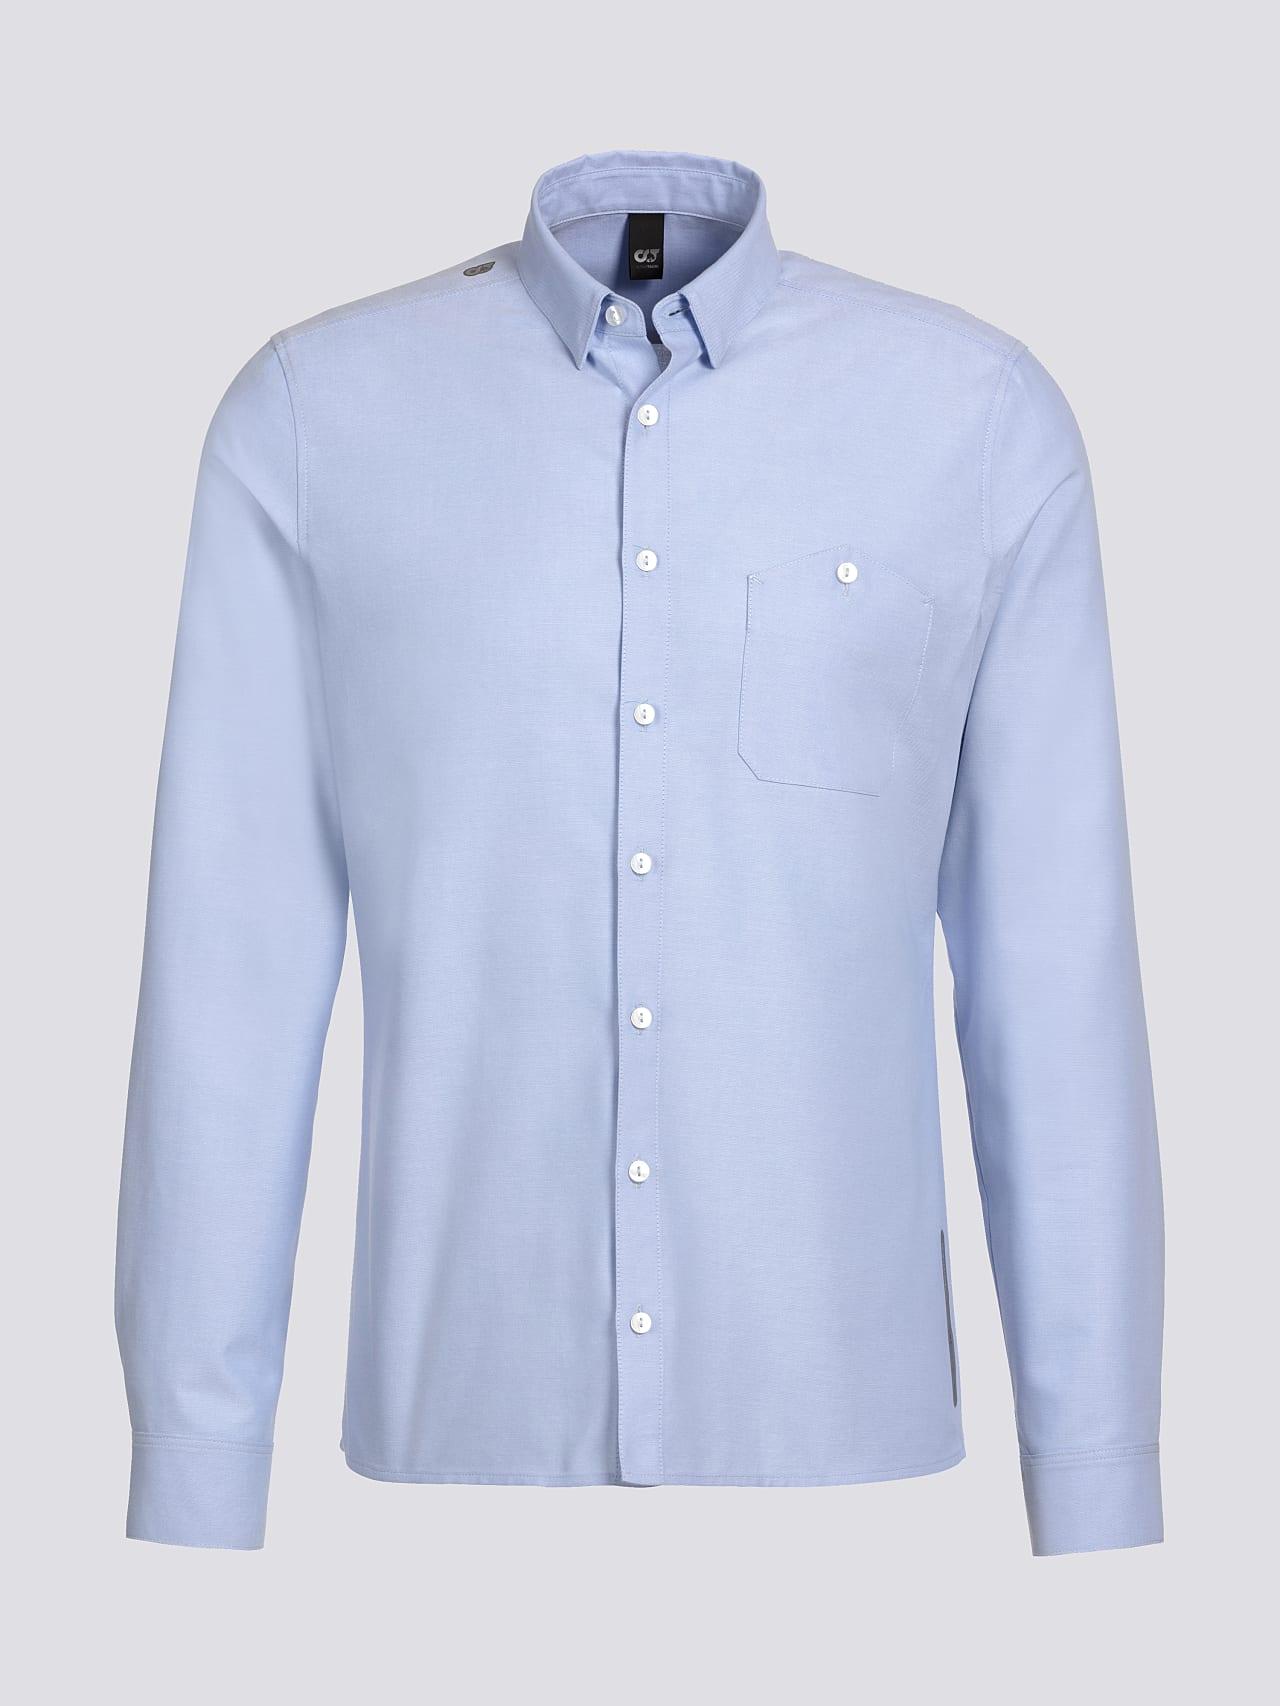 WOSKA V2.Y5.01 Kent Collar Oxford Shirt light blue Back Alpha Tauri